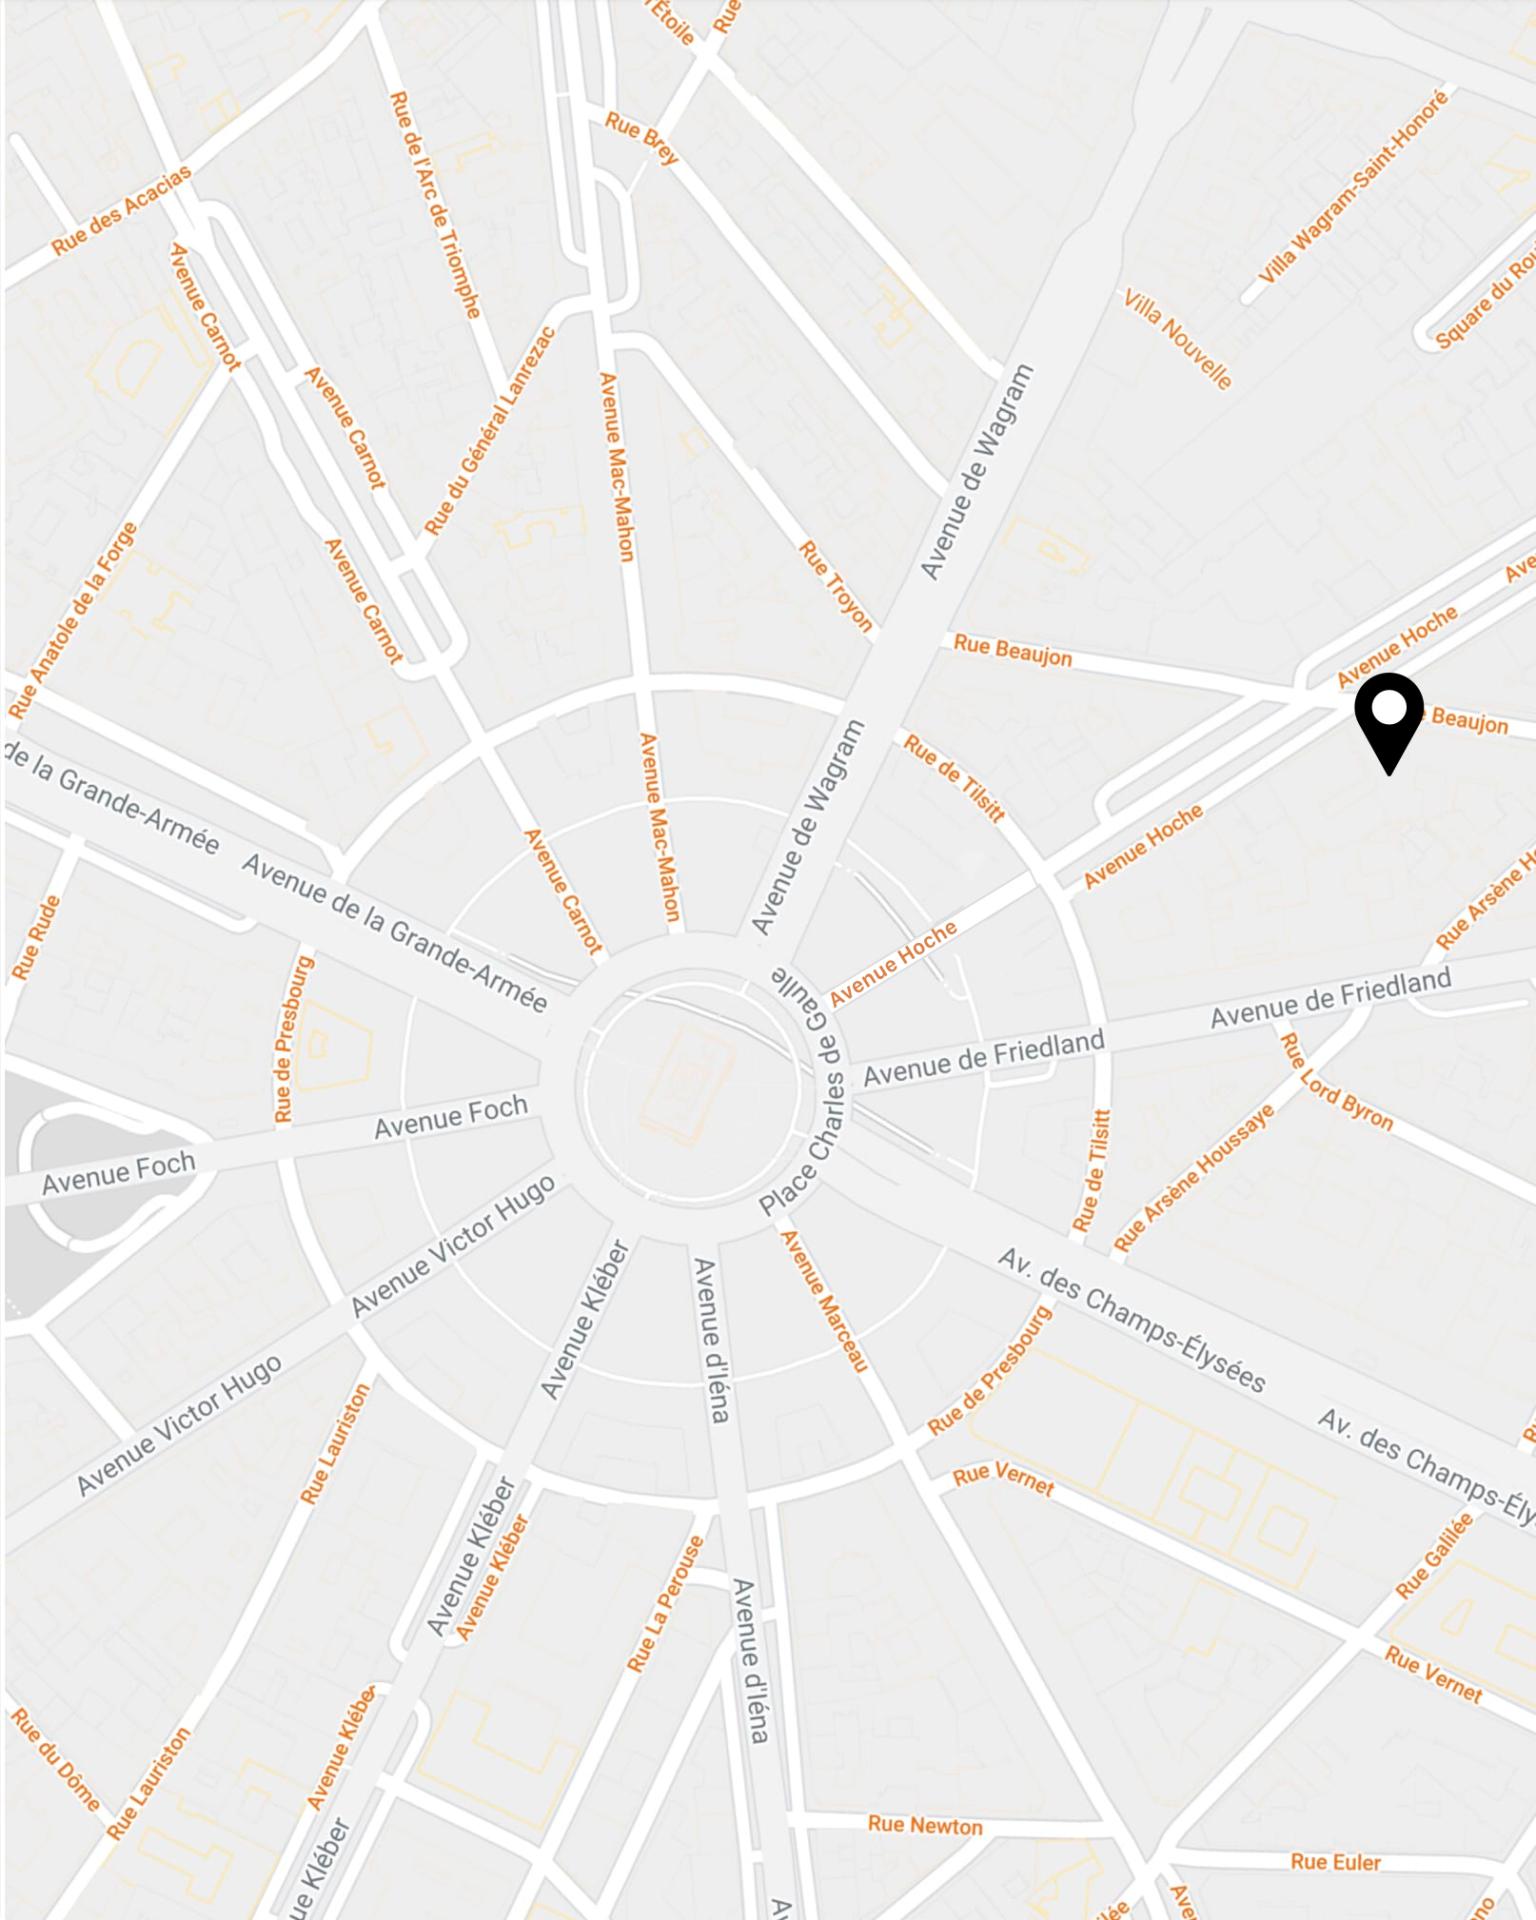 ayache-map